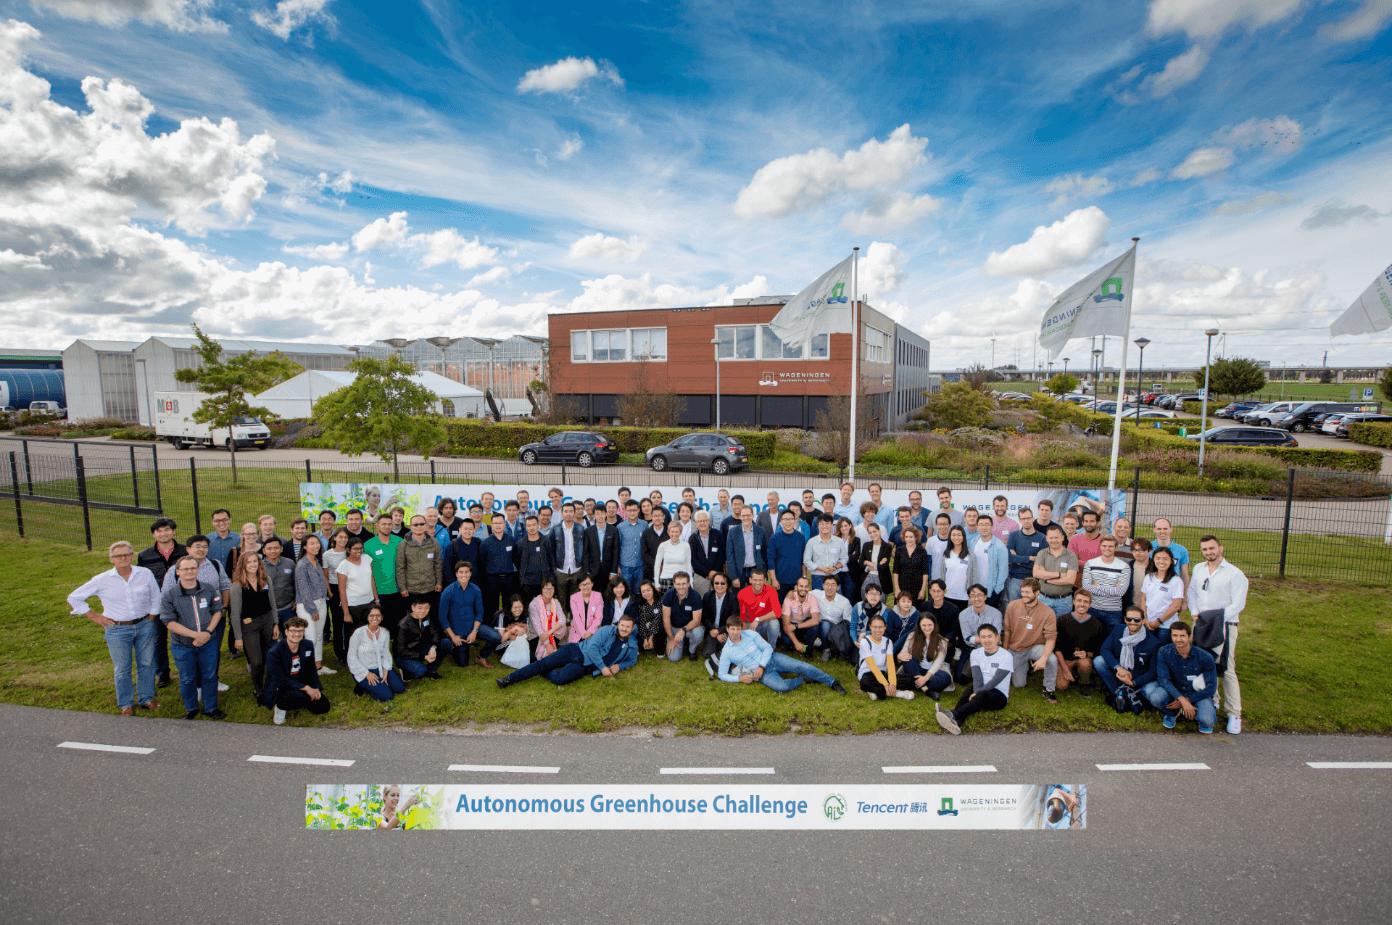 Autonomous Greenhouse Challenge 2019